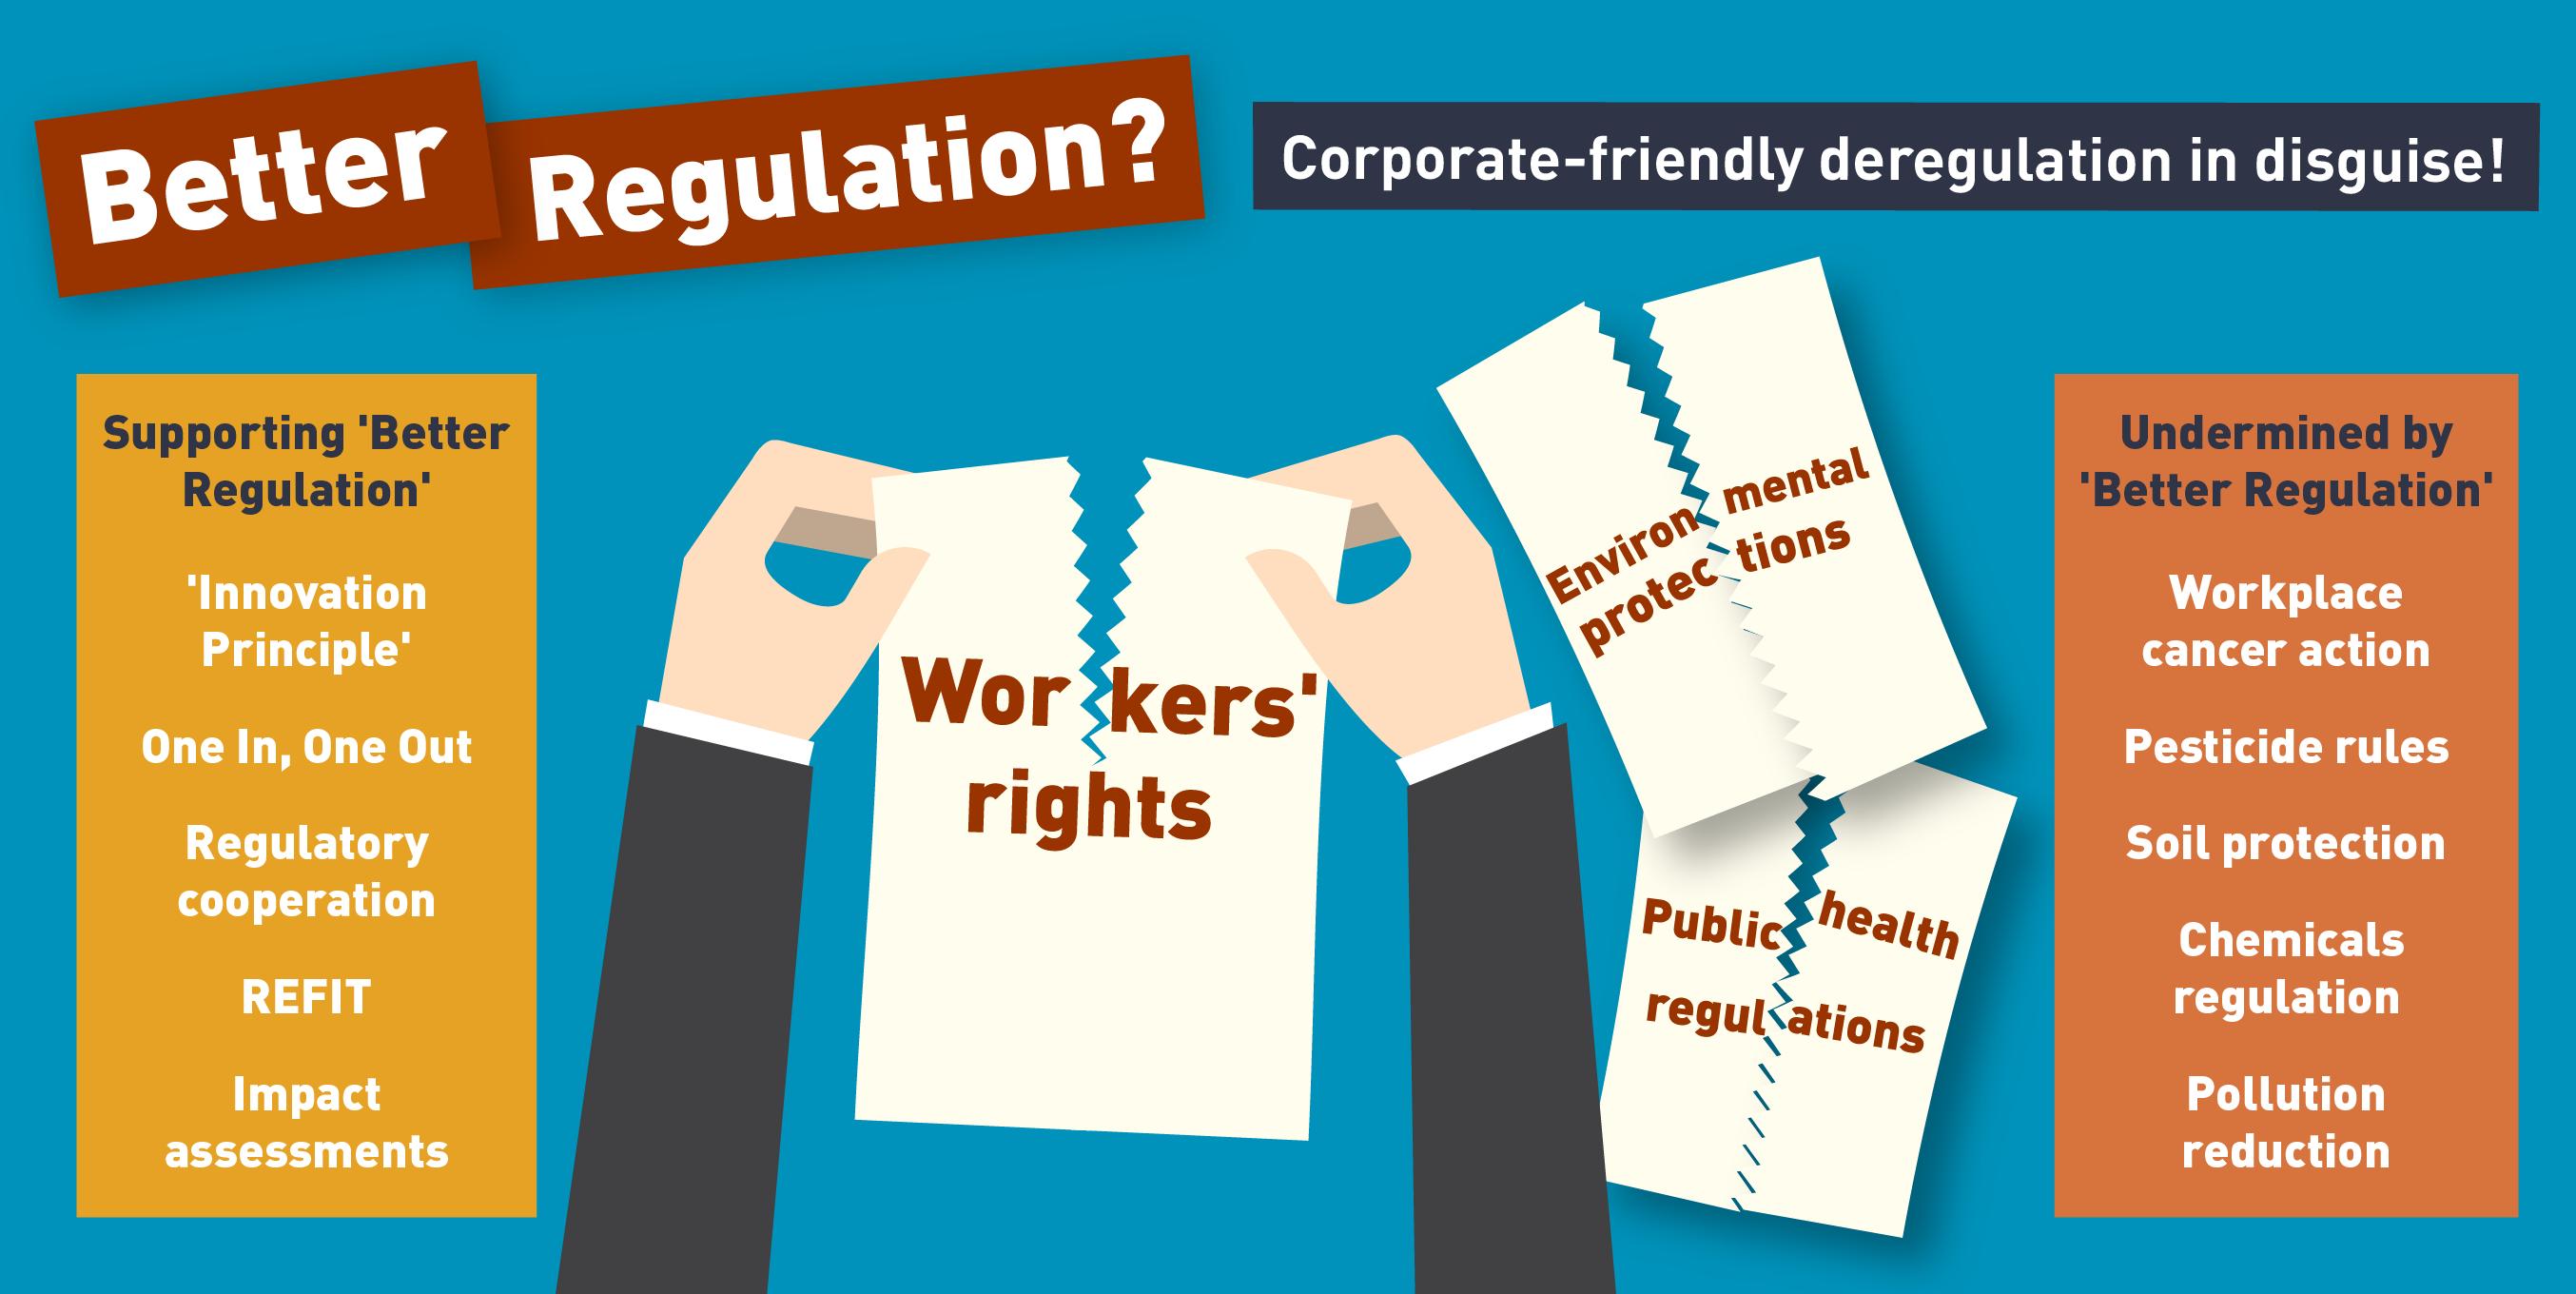 Better Regulation image